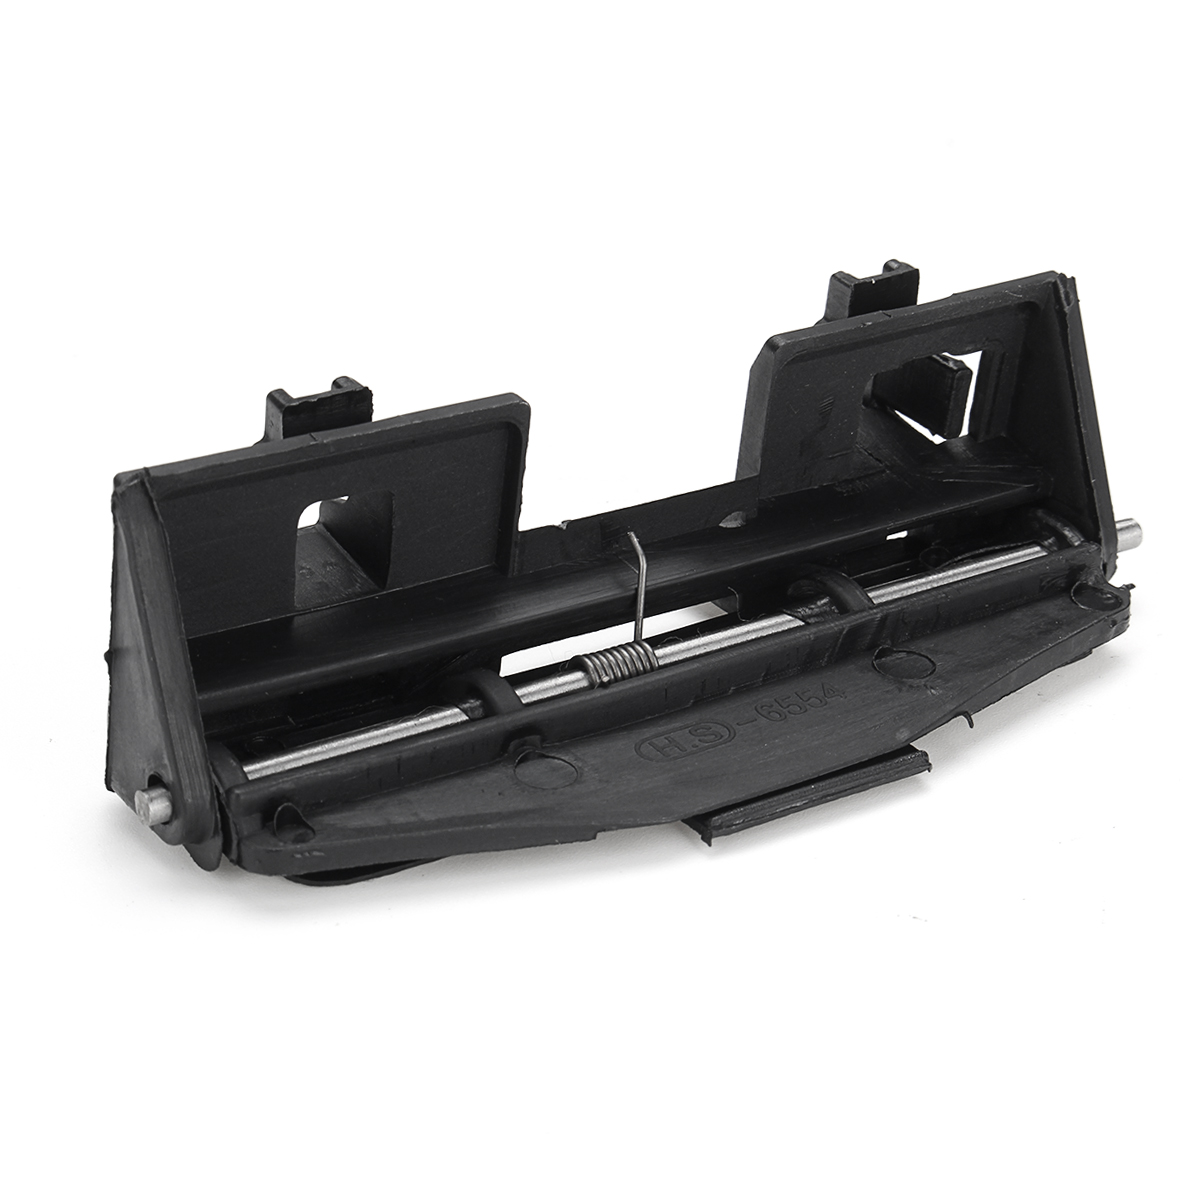 Fuel Tank Gas Door Hinge Filler Flap Hinge Plastic&Aluminum For BMW 5 7 Series E32 E34 Saloon 51171928197